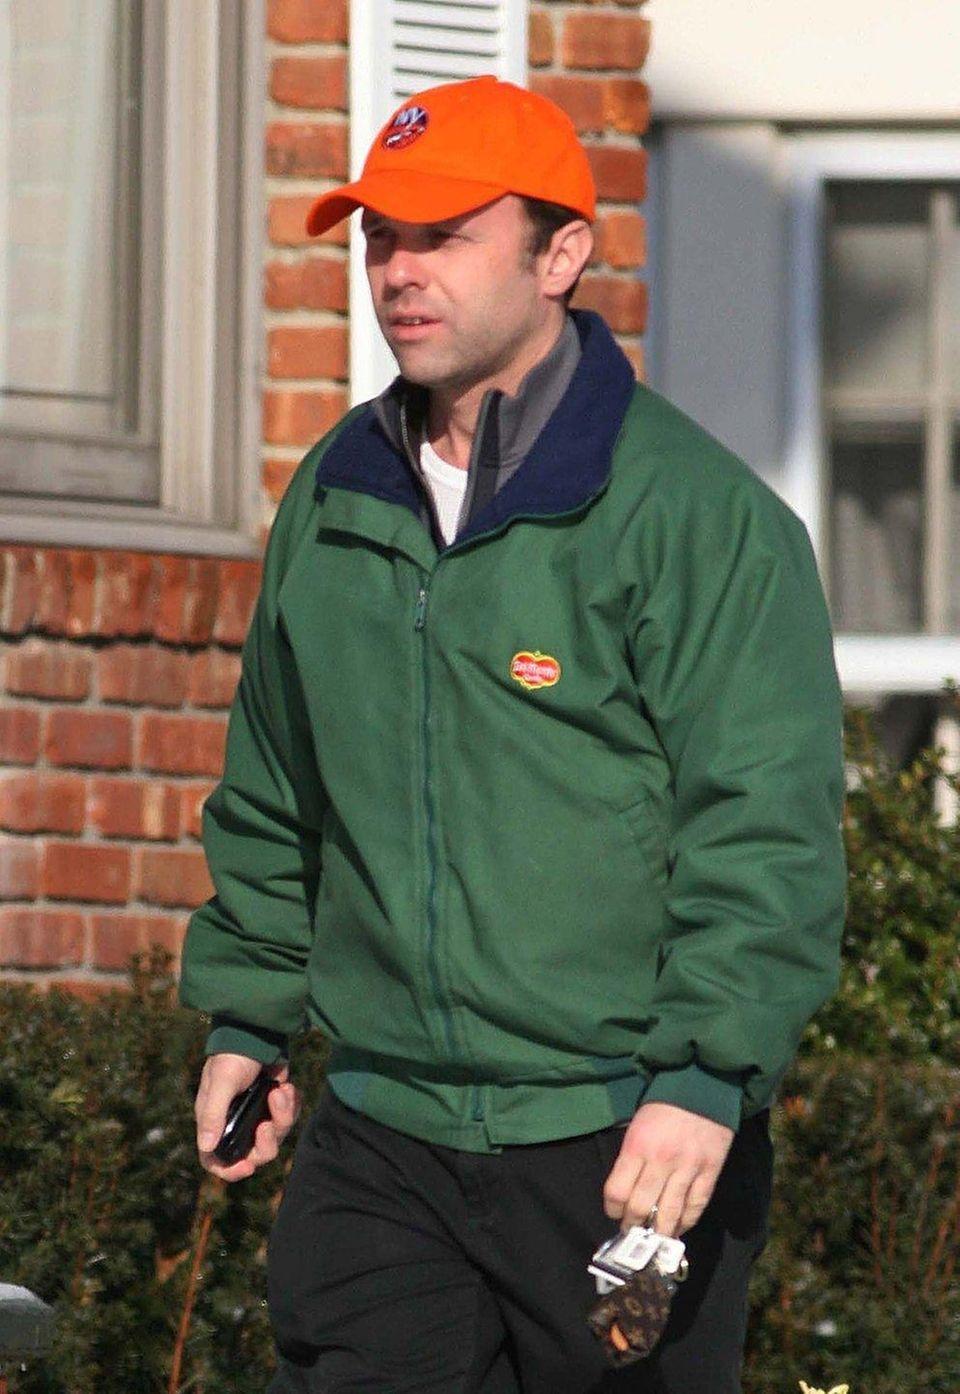 Mark Reilly Long Island Mechanic